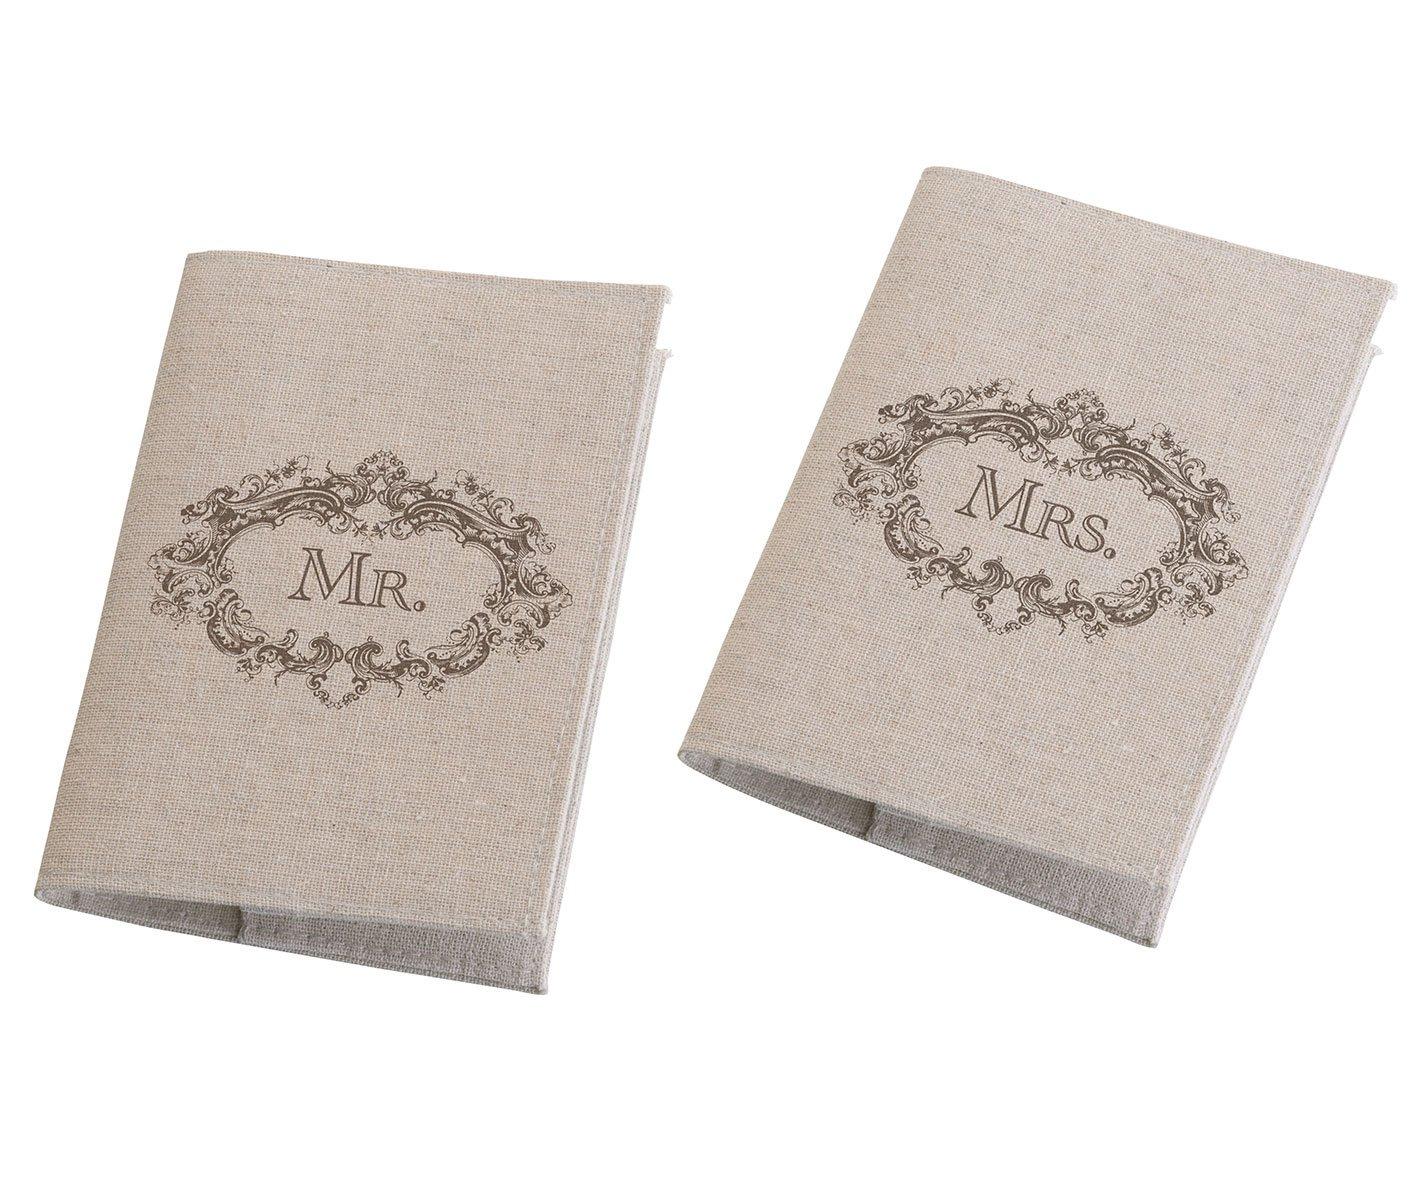 Passport Covers Lillian Rose Mr and Mrs 8 x 5.75 Tan